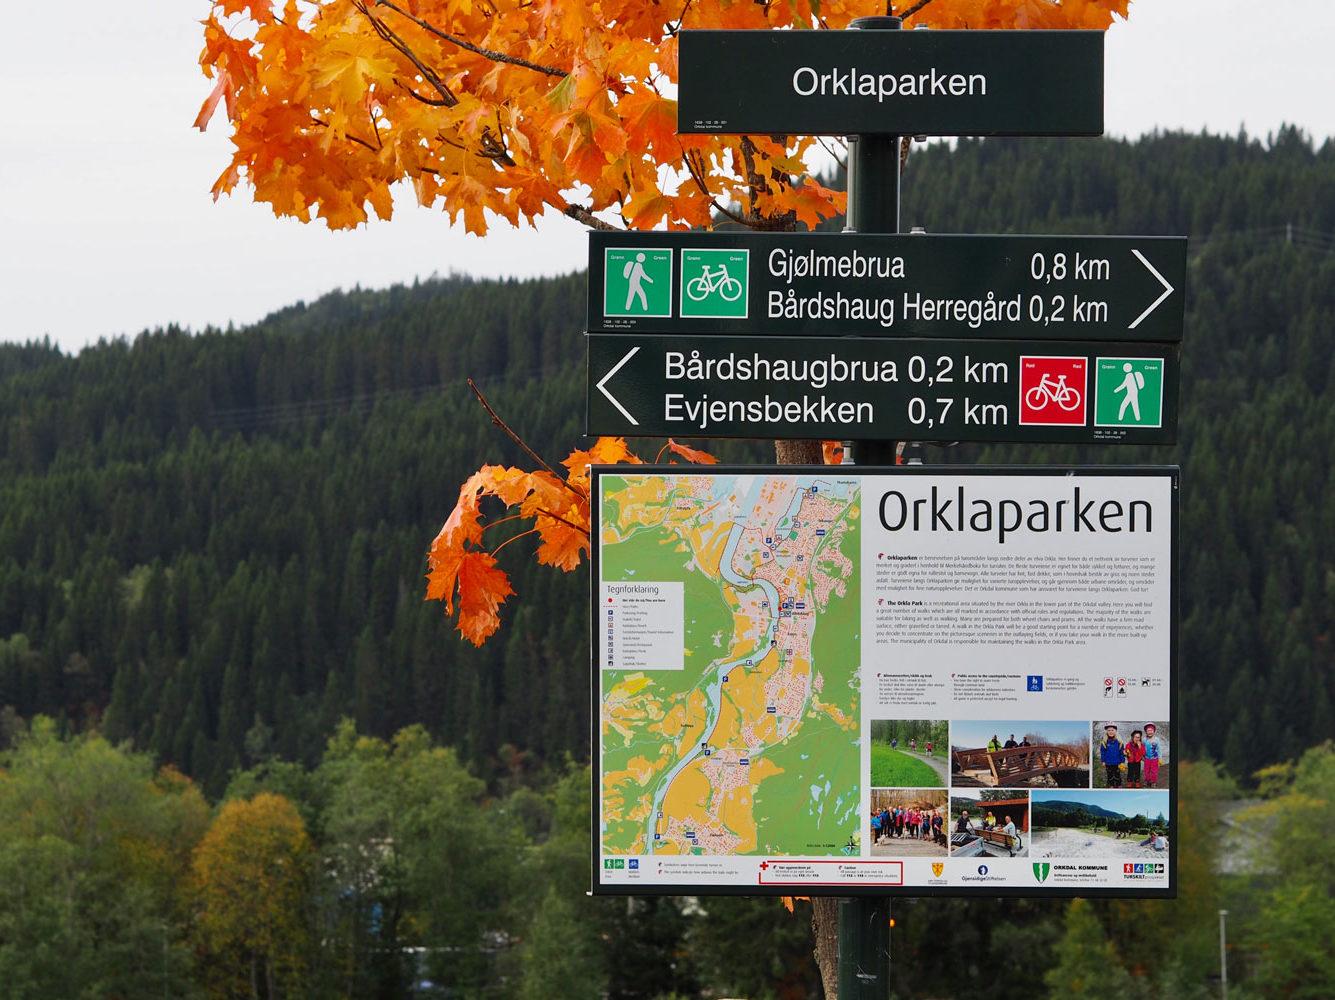 Orklaparken skilt og kart